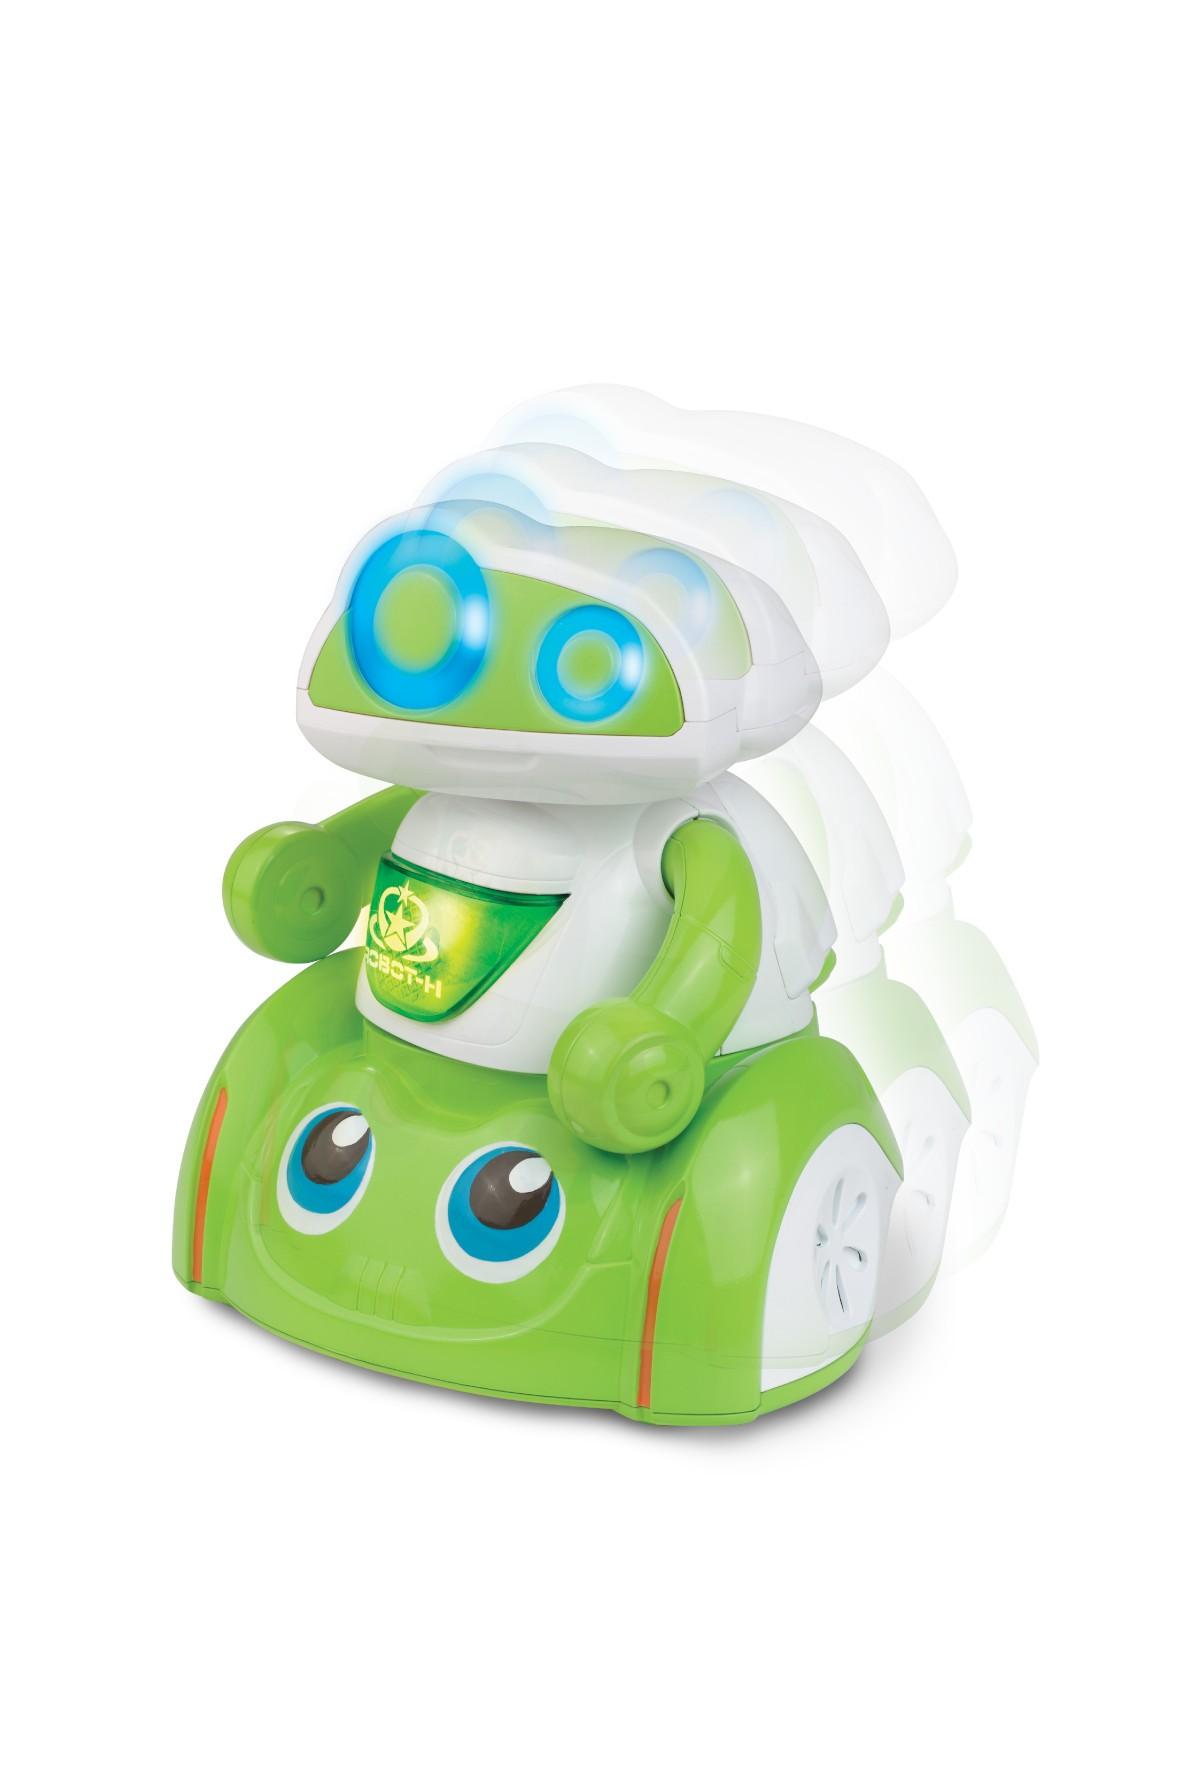 Robot Kosma